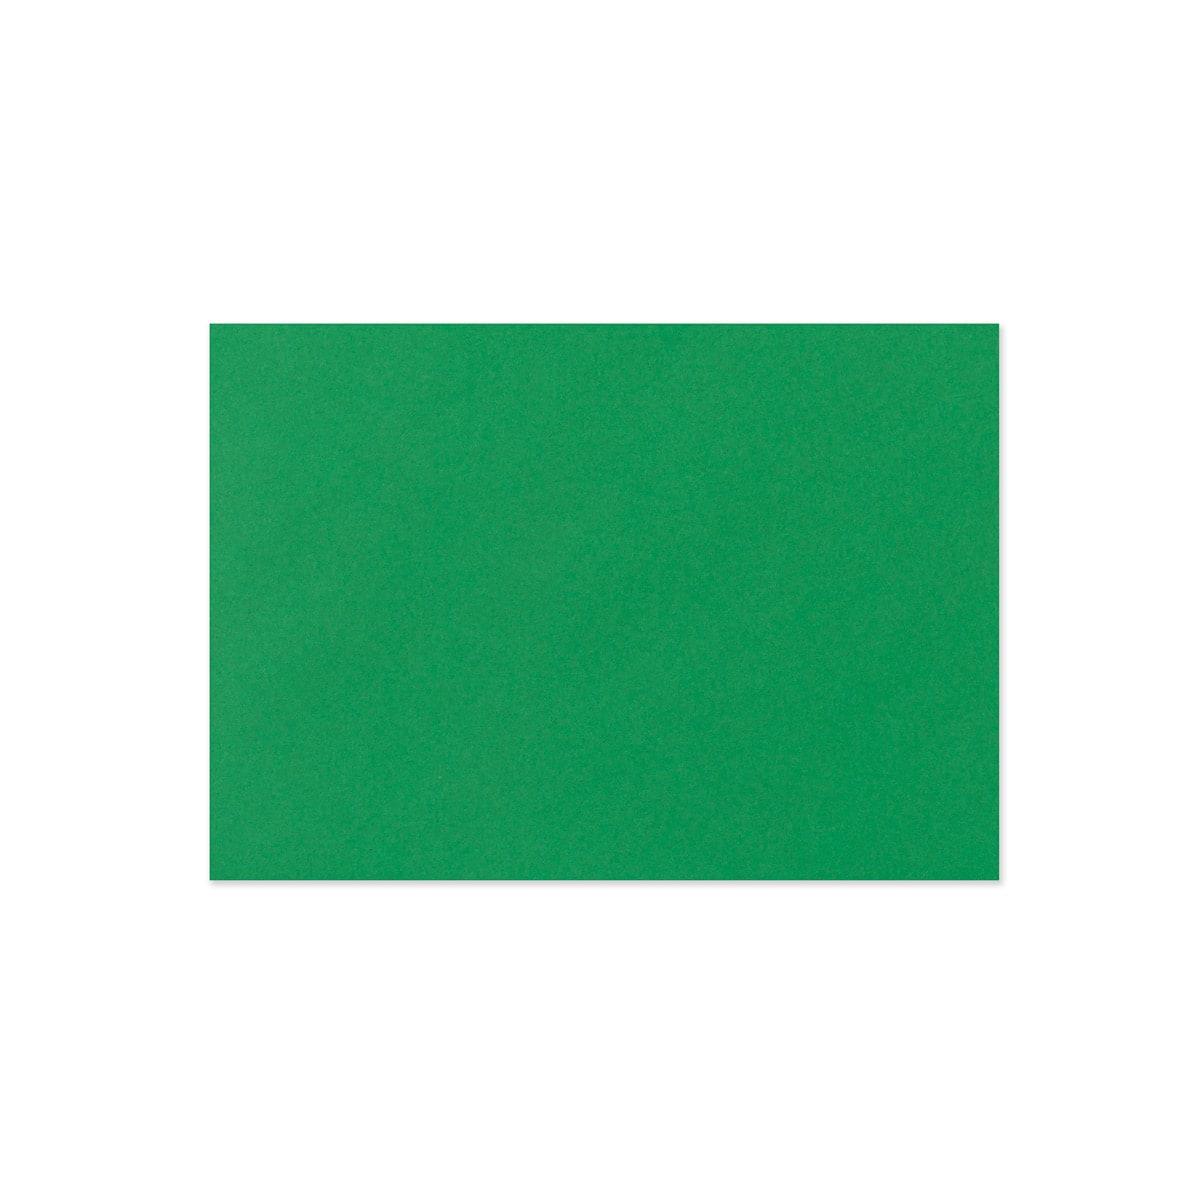 DARK GREEN 125 x 175 mm ENVELOPES 120GSM